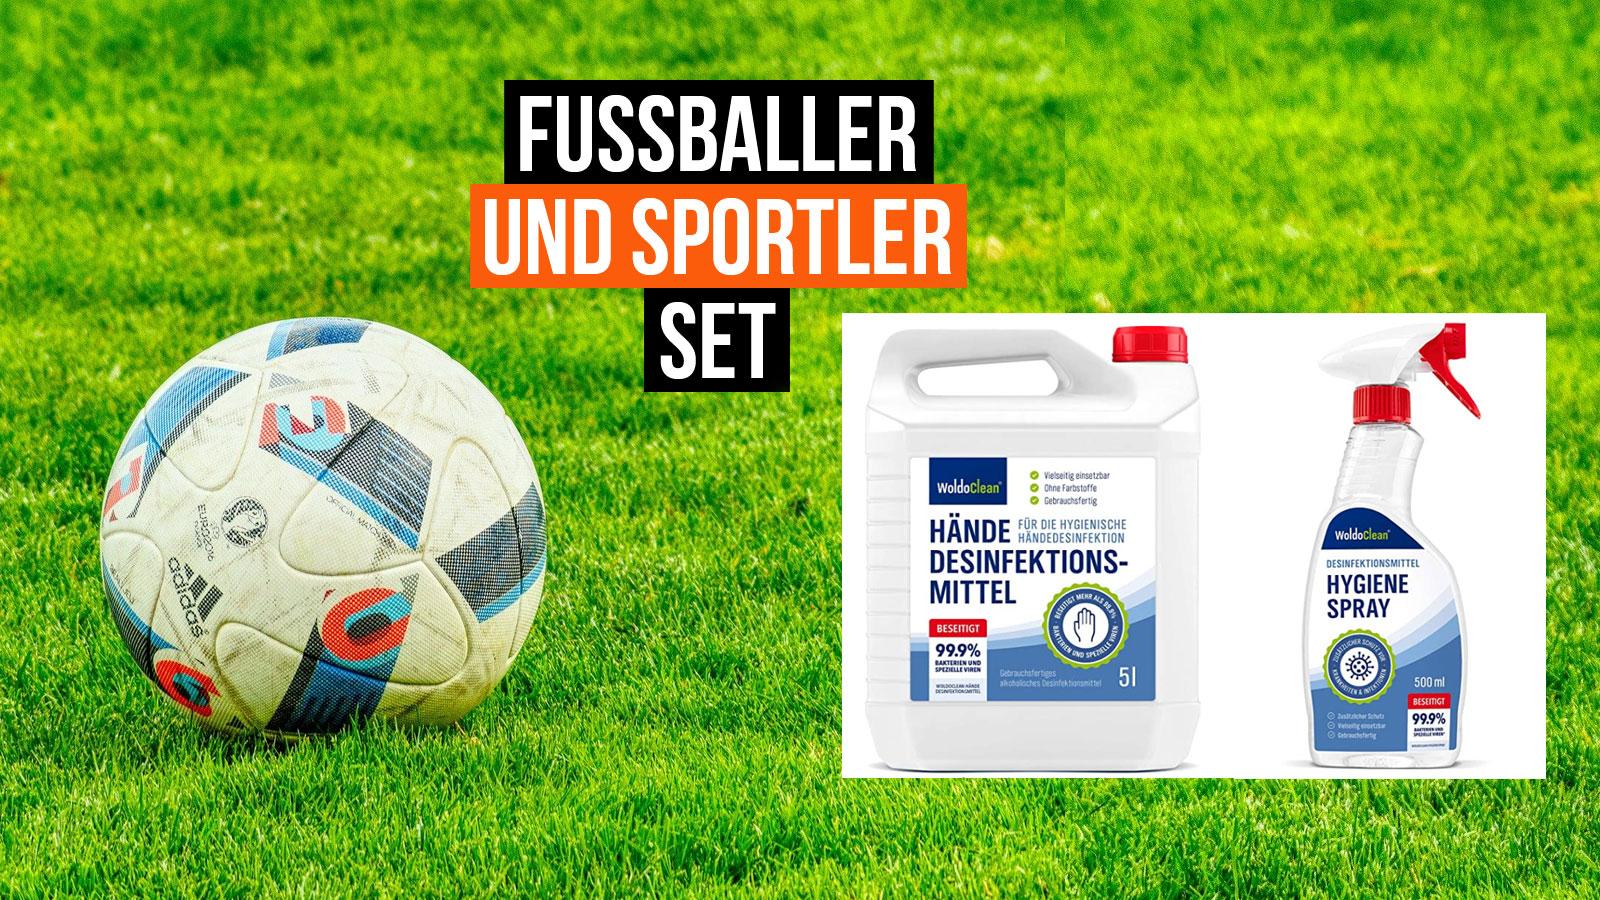 Das Fussball-Desinfektionsmittel-Set jetzt günstig online bestellen